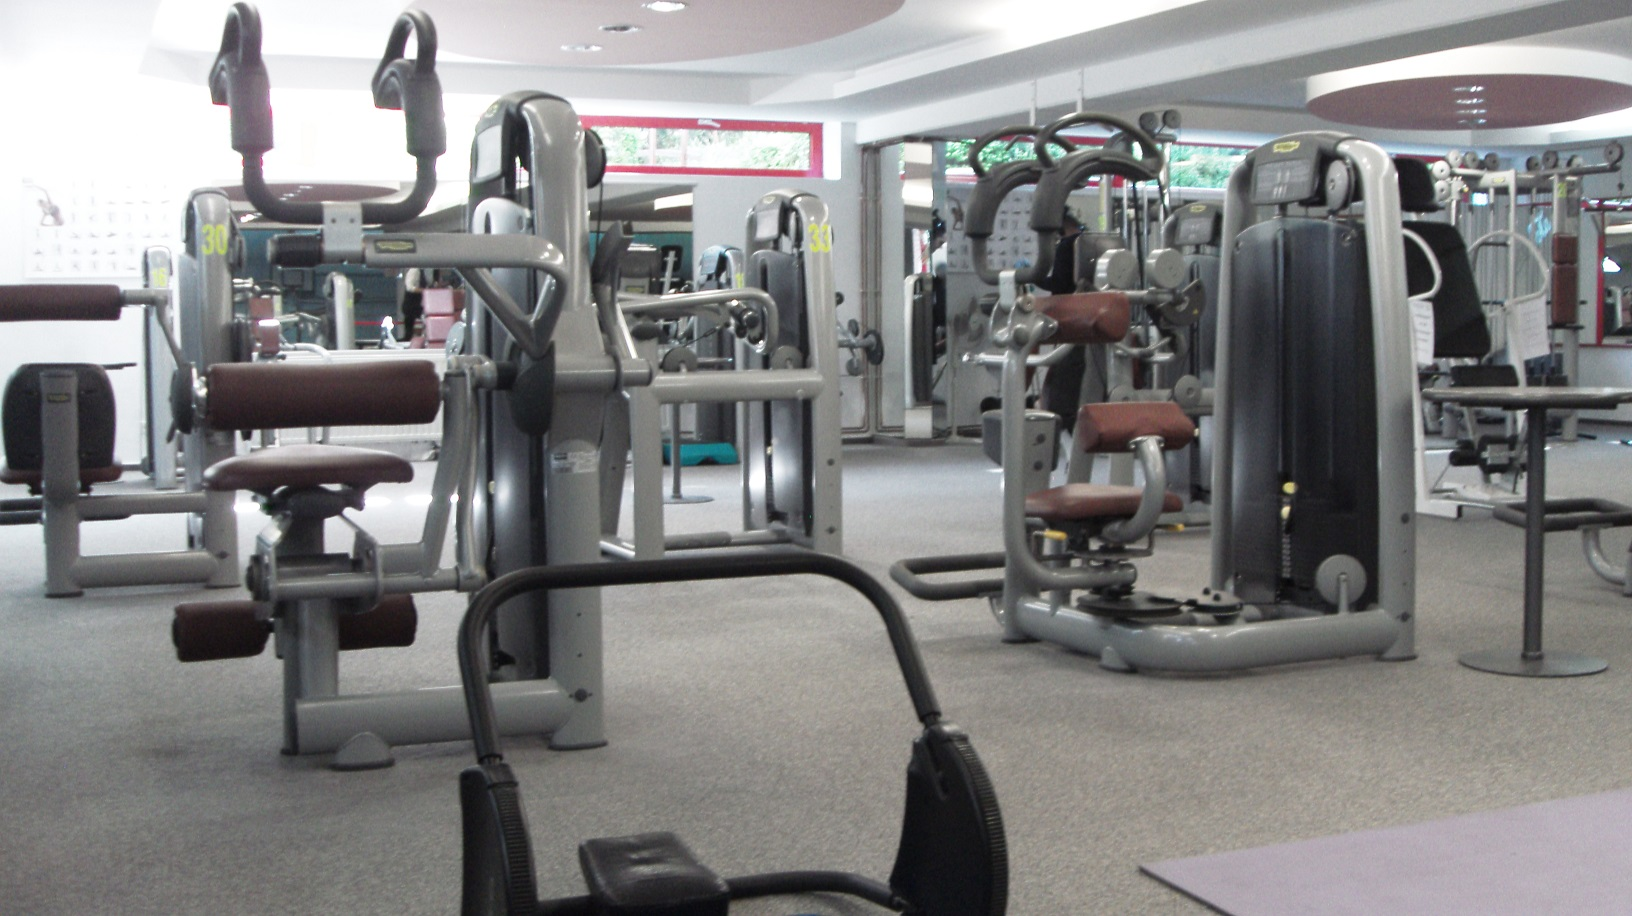 Fitness Halle 2